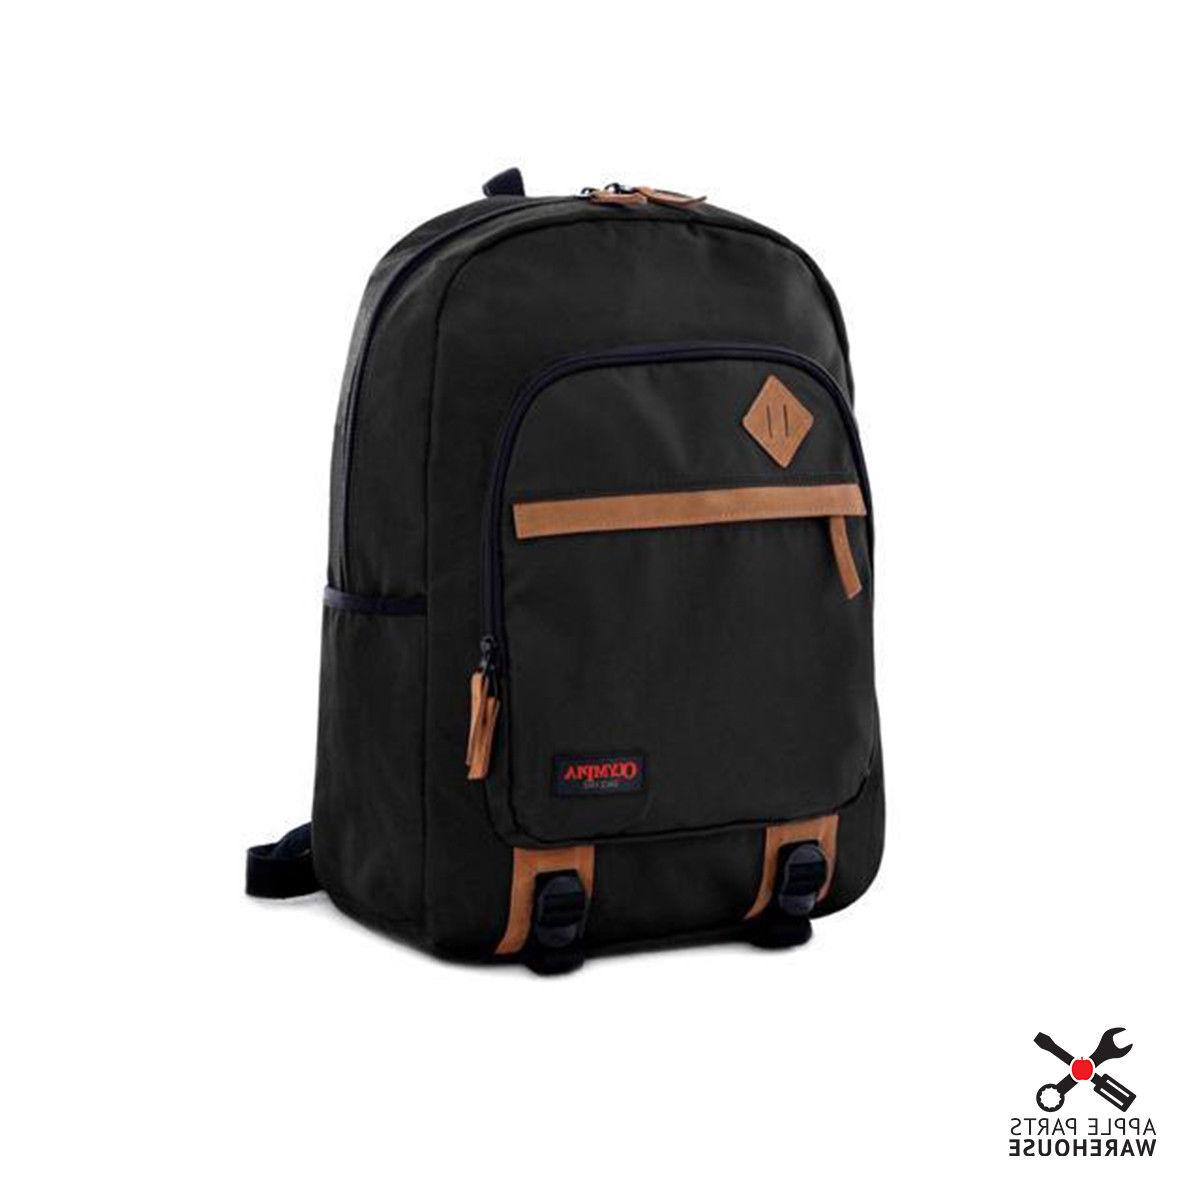 Aston 18 Backpack, Black